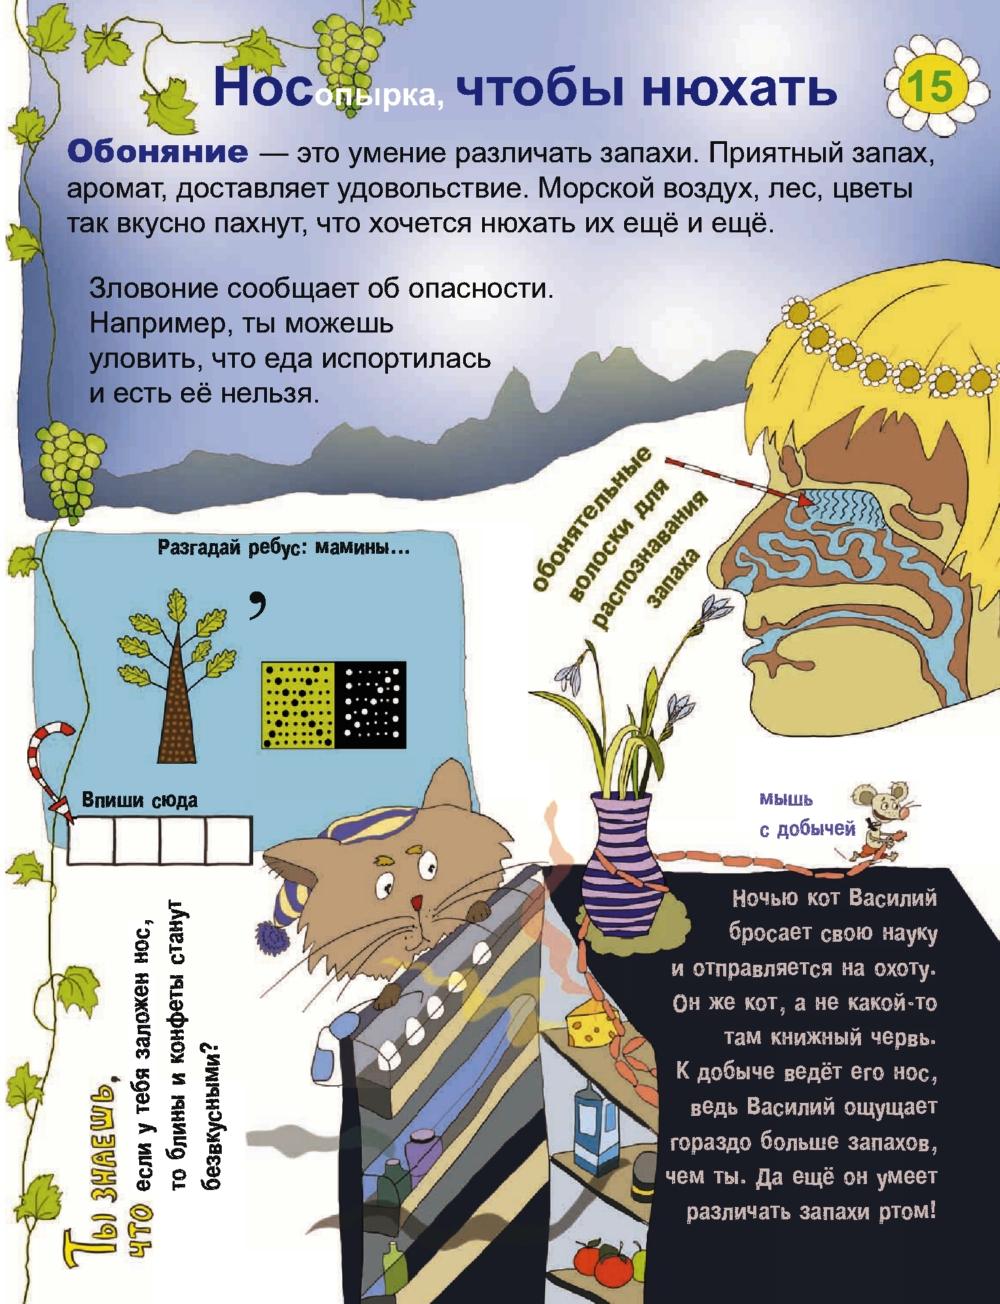 http://i1.imageban.ru/out/2013/12/09/64e7a973e6b0b8cd31d857e7a7a07bc3.jpg